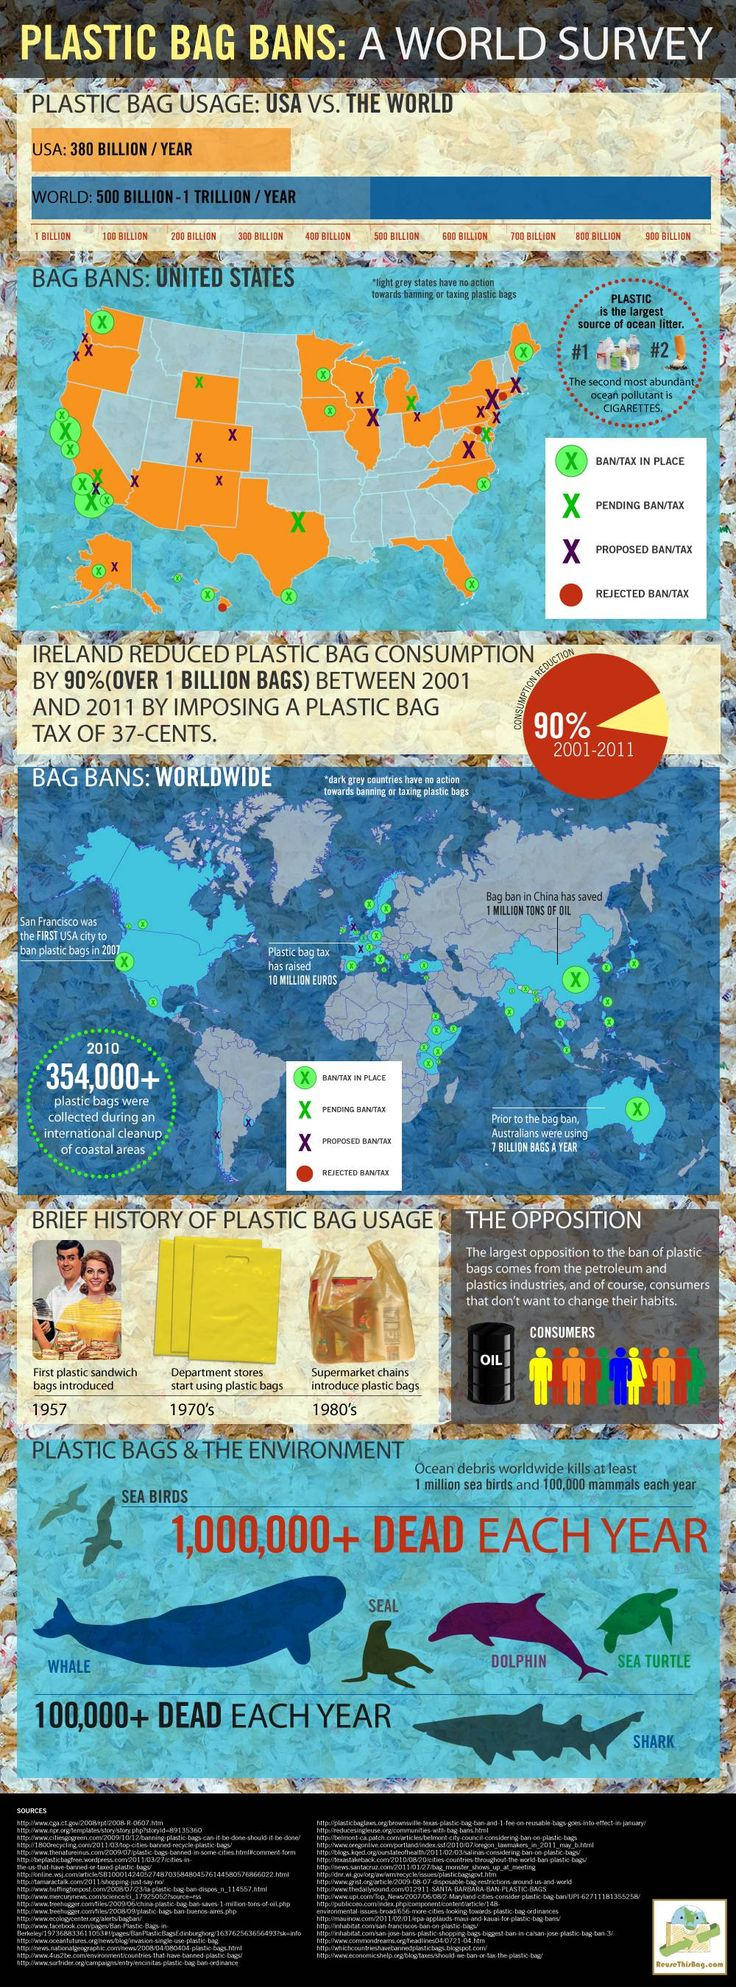 Plastic Bag Bans around the world.